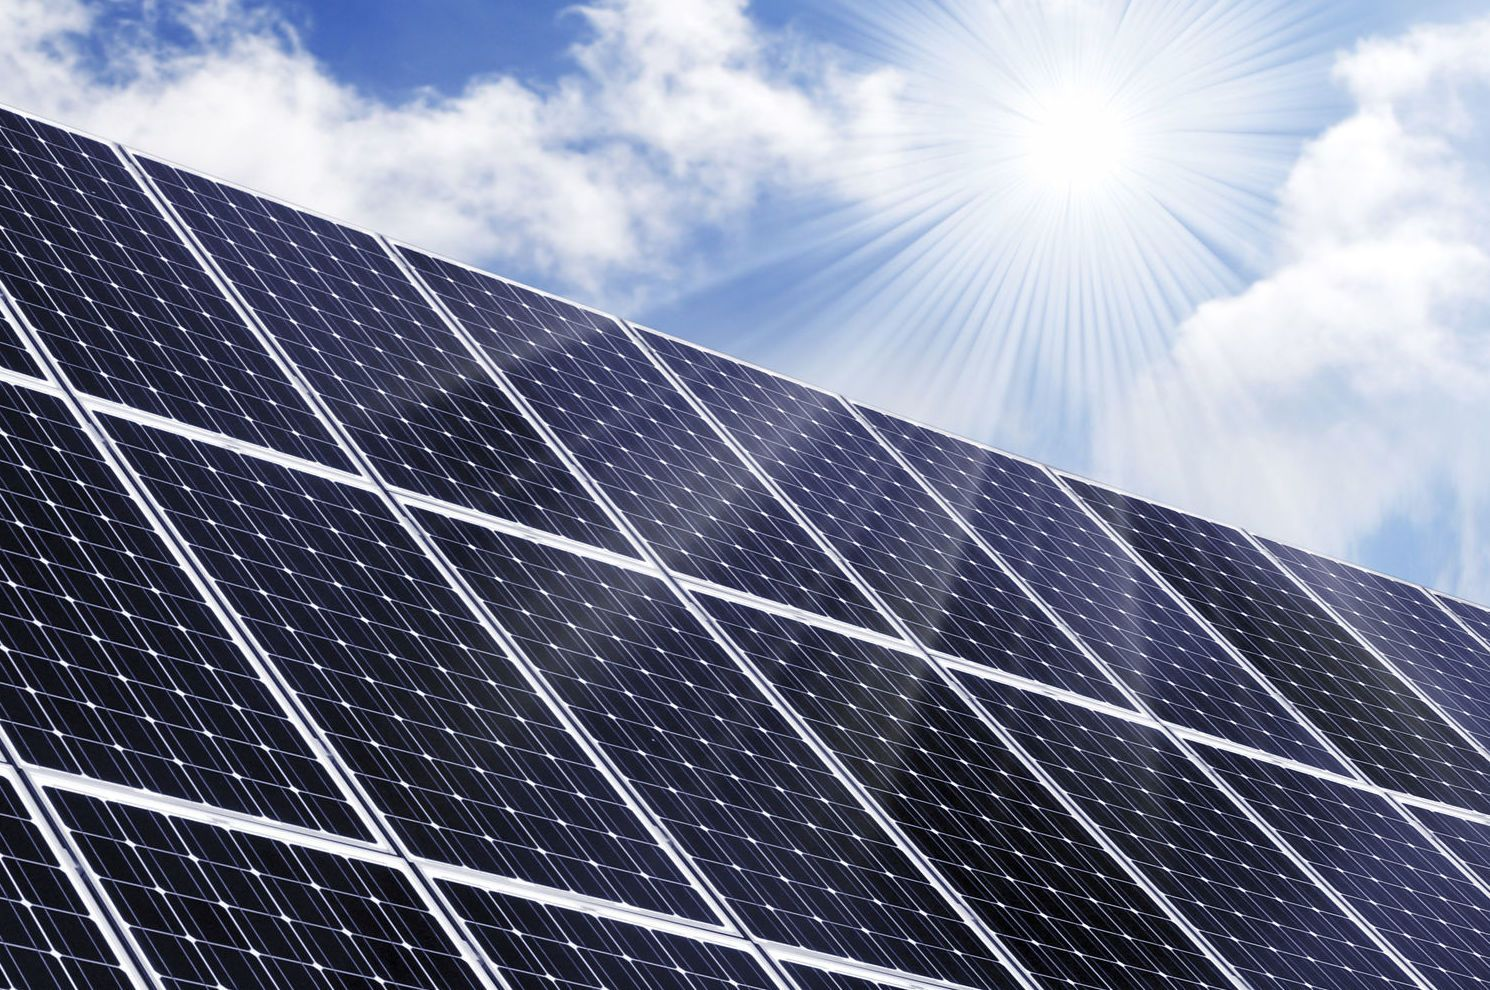 Energia solar en madrid amazing instalacin de energa solar en toledo y madrid with energia - Energia solar madrid ...